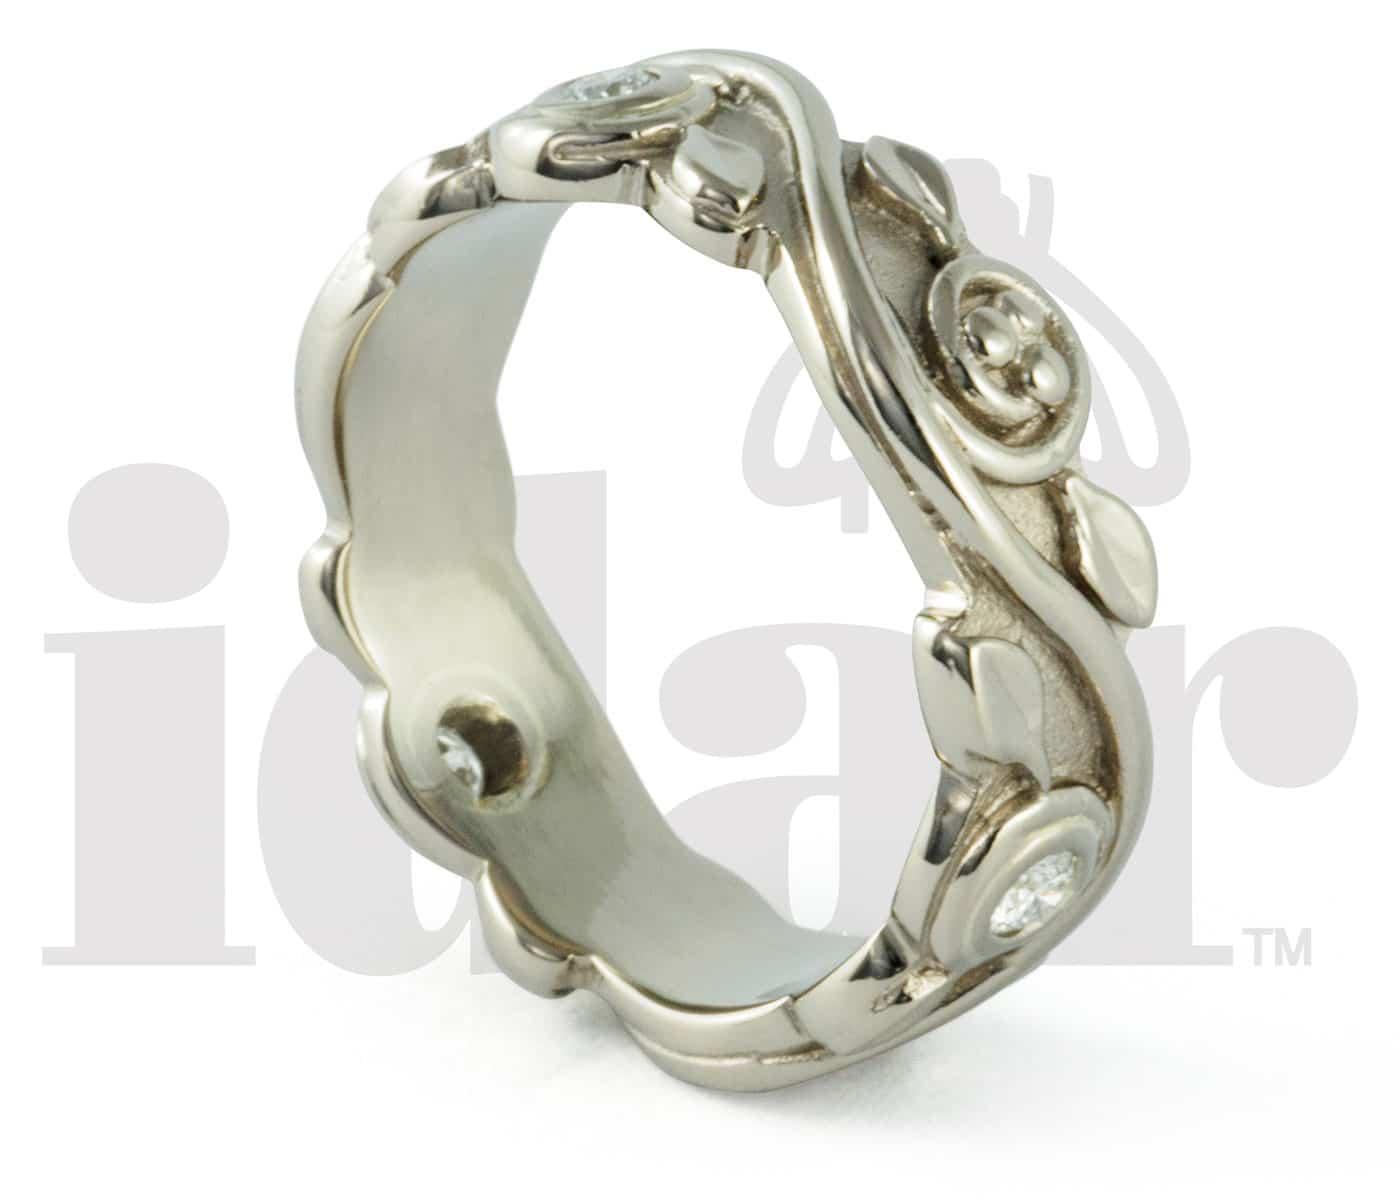 Tree of Life Ring, Idar Jewellers, diamonds, gold handcrafted jewellery, Victoria, BC, Vancouver, Calgary, Edmonton, Ottawa, Toronto, Montreal, Canada